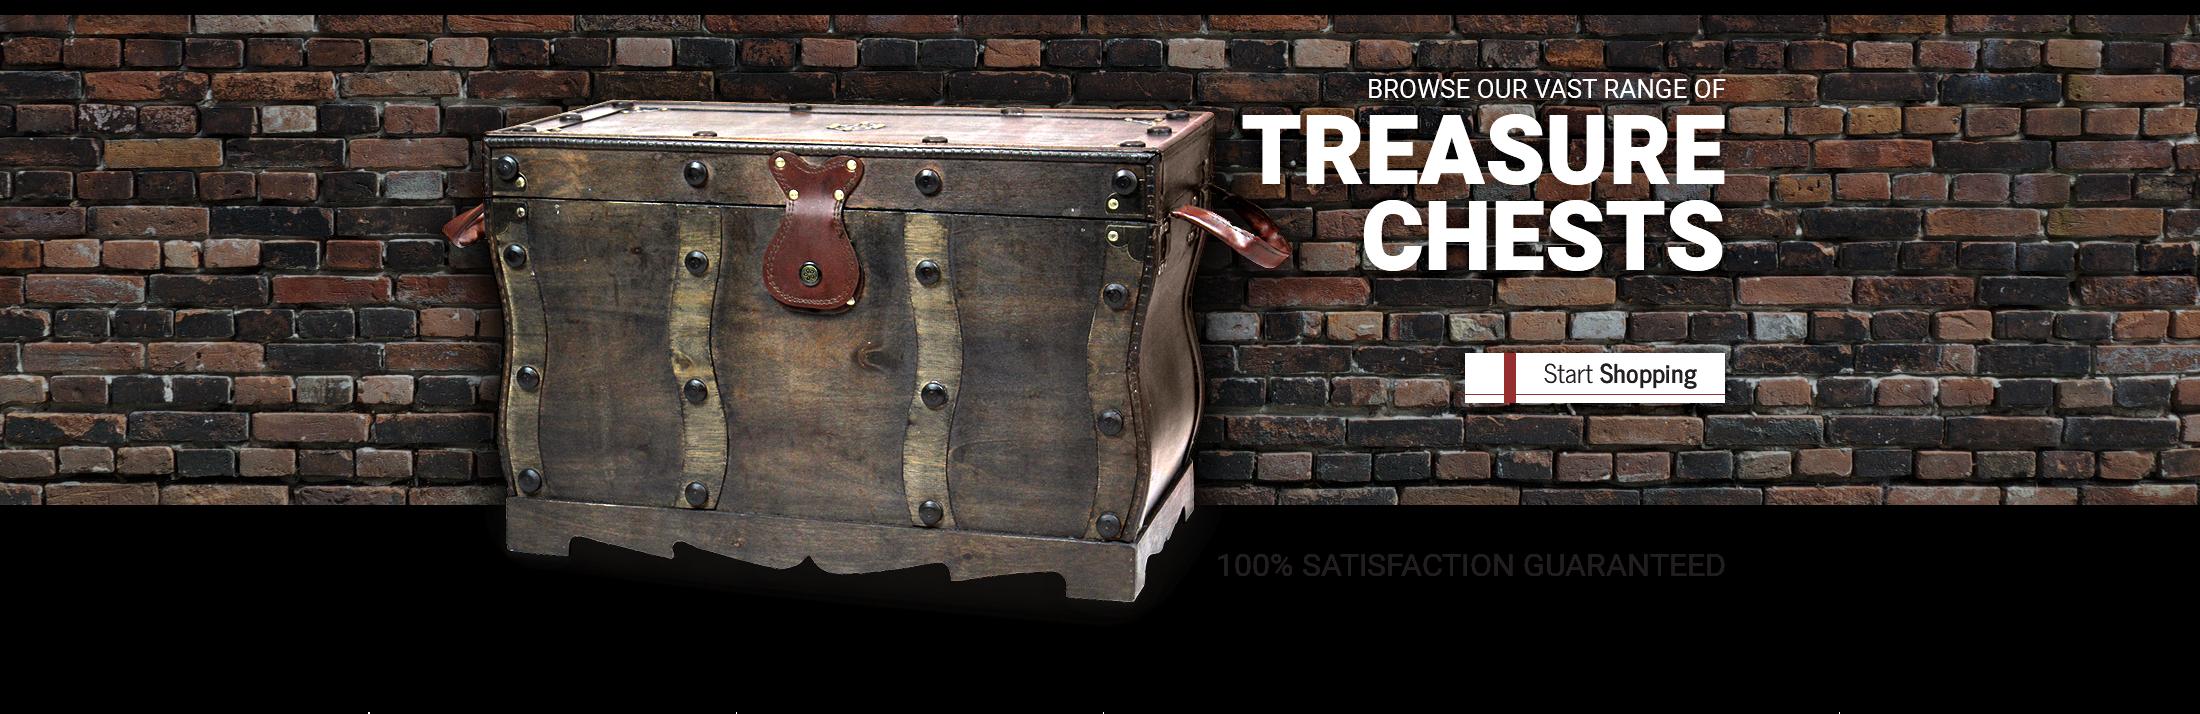 Treasure Chests - Start Shopping